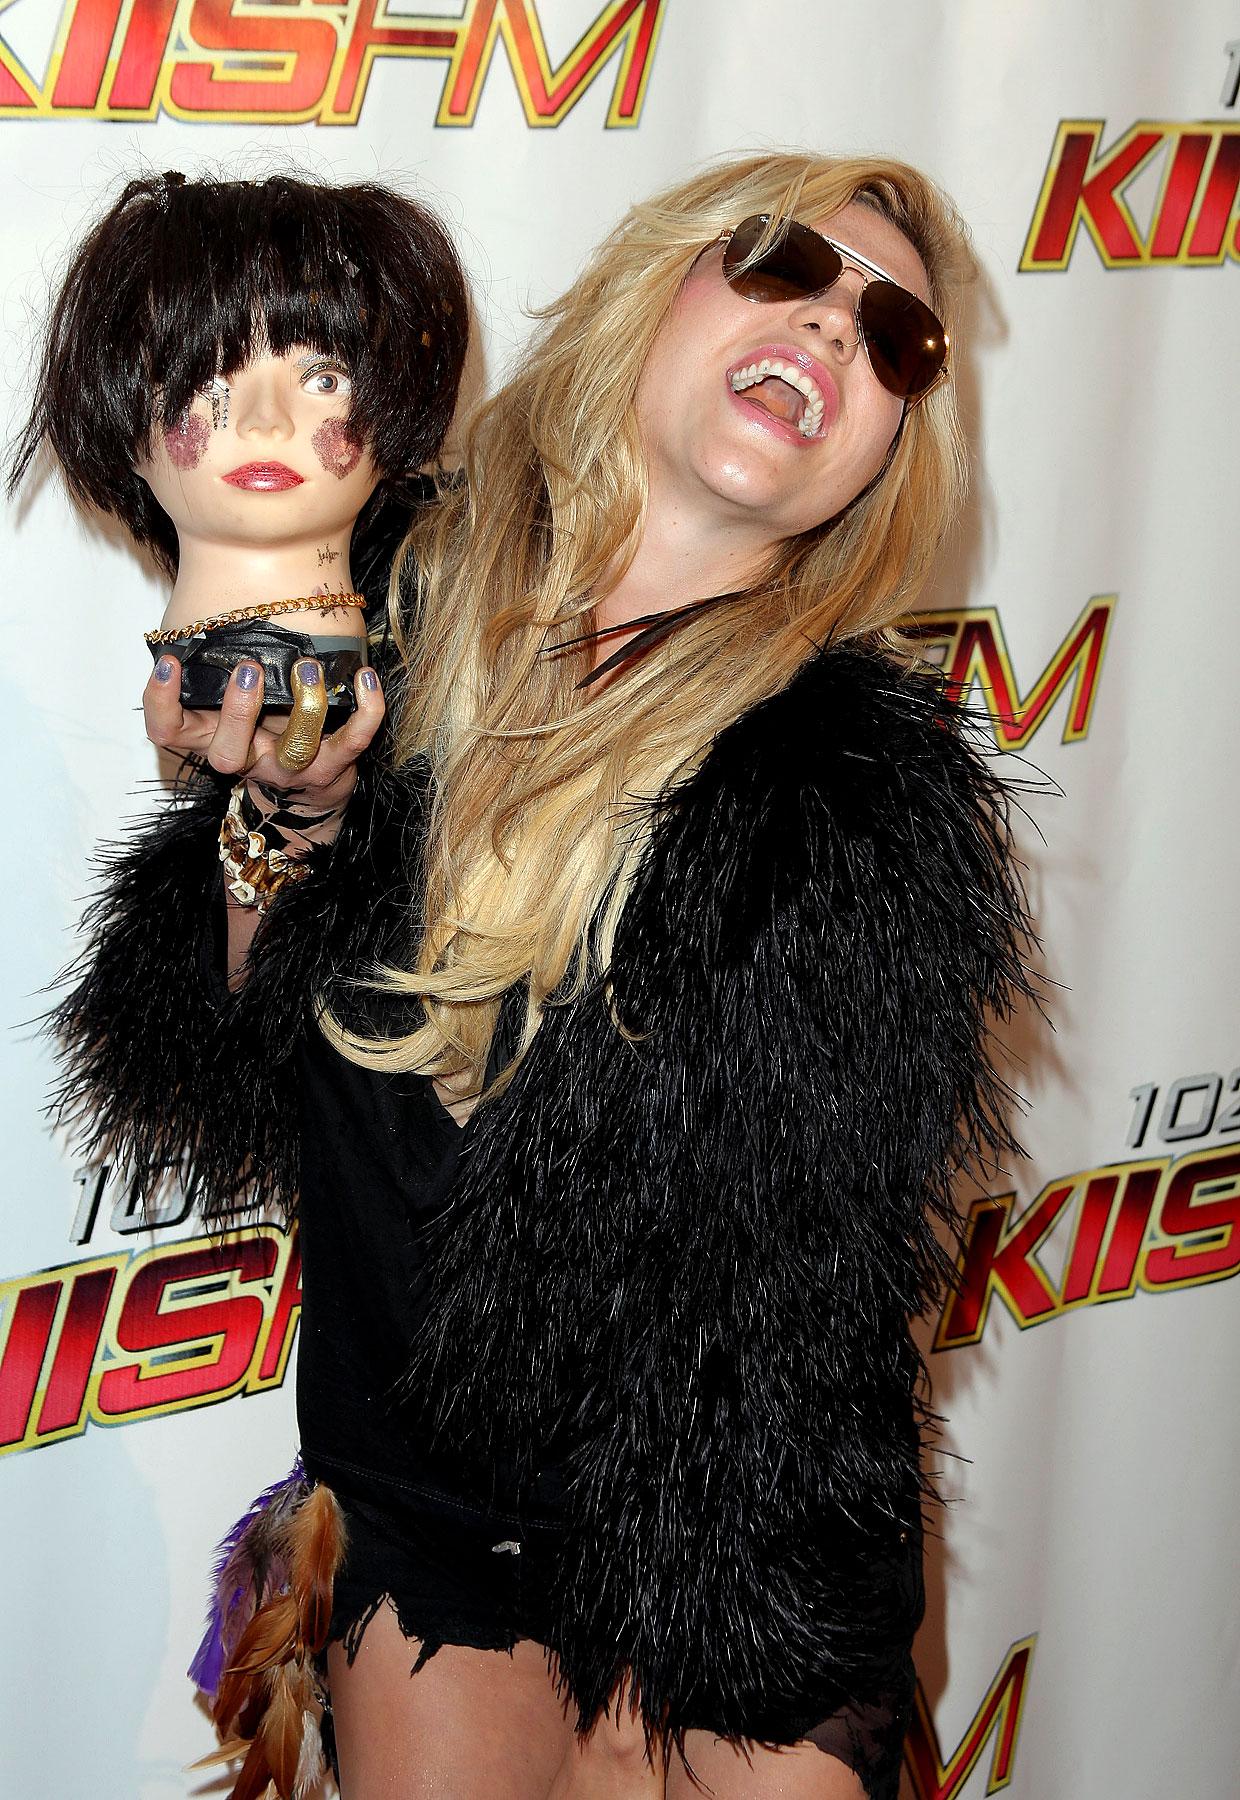 Kesha Accessorizes With Dismembered Head At Wango Tango (PHOTOS)